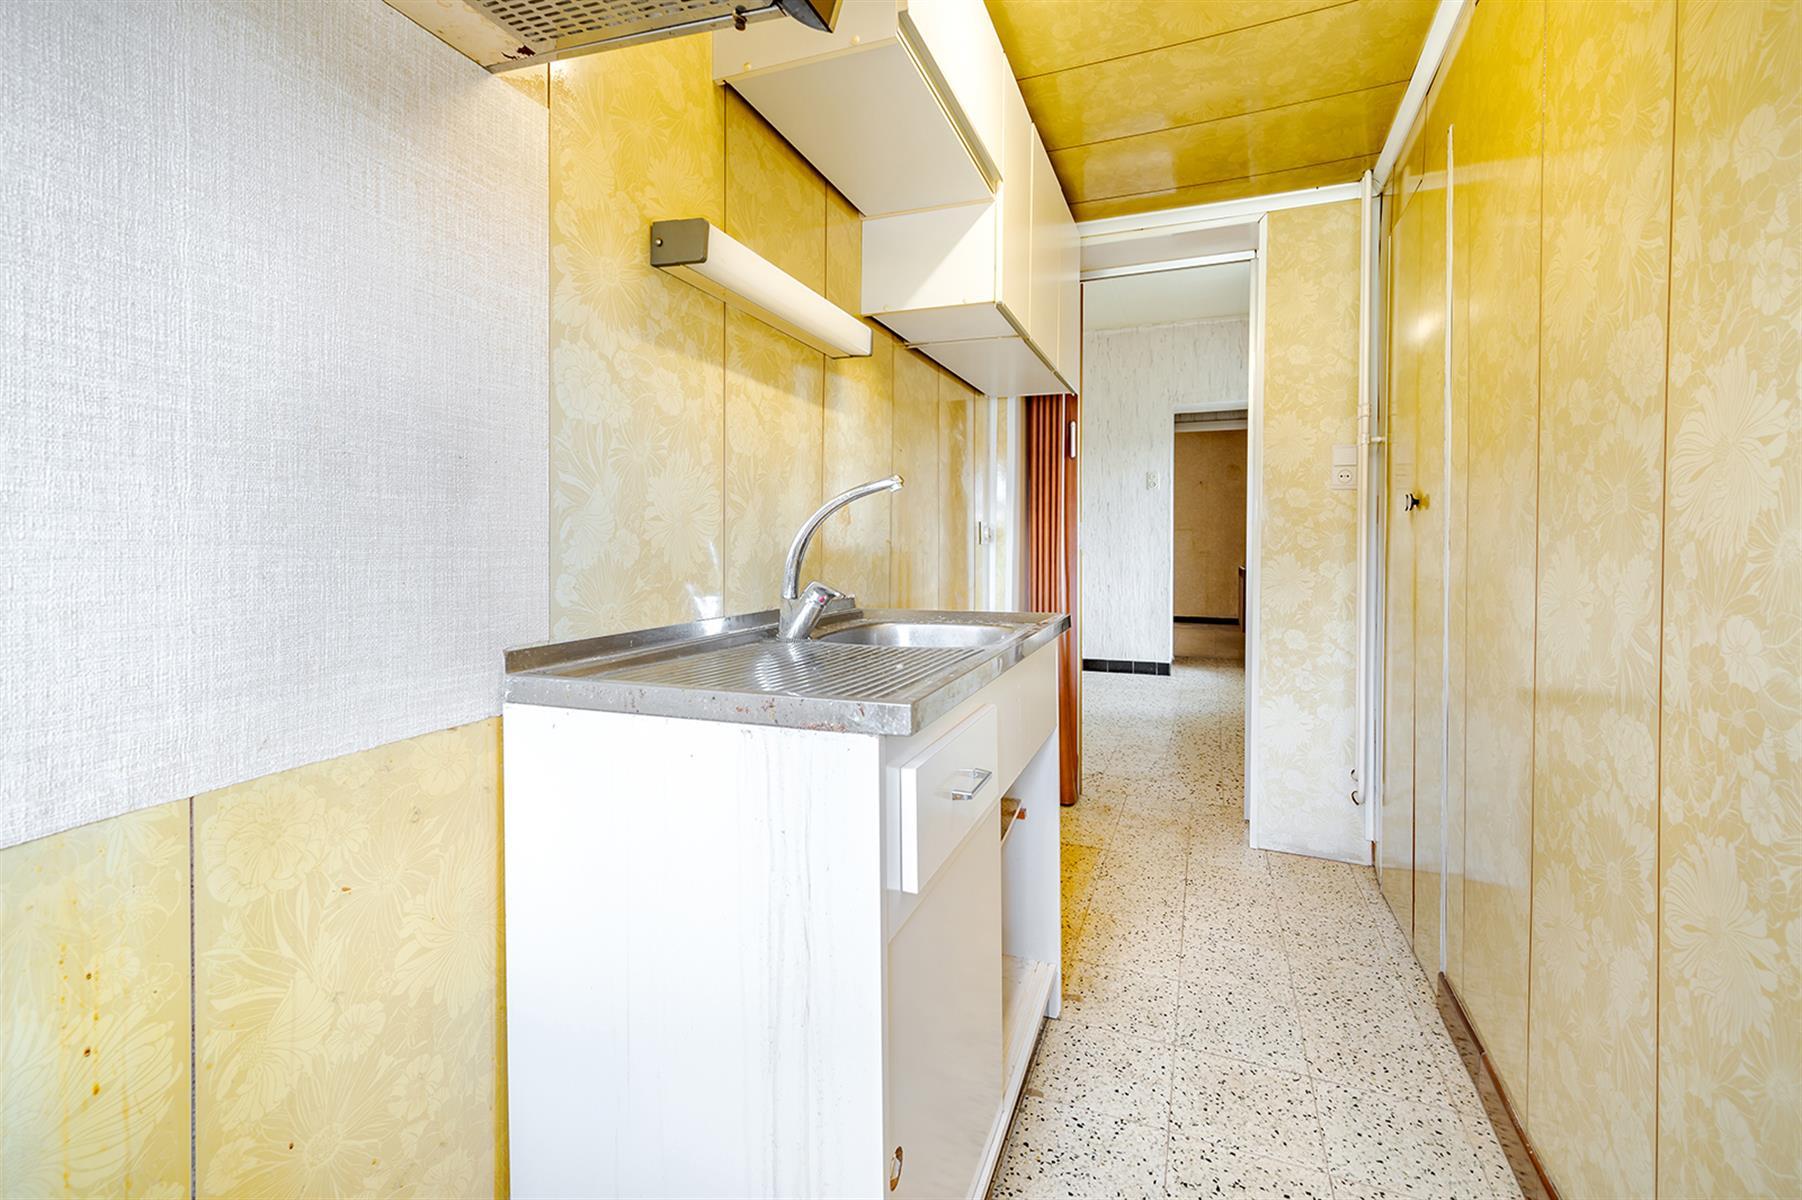 Maison - Remicourt - #4293207-5